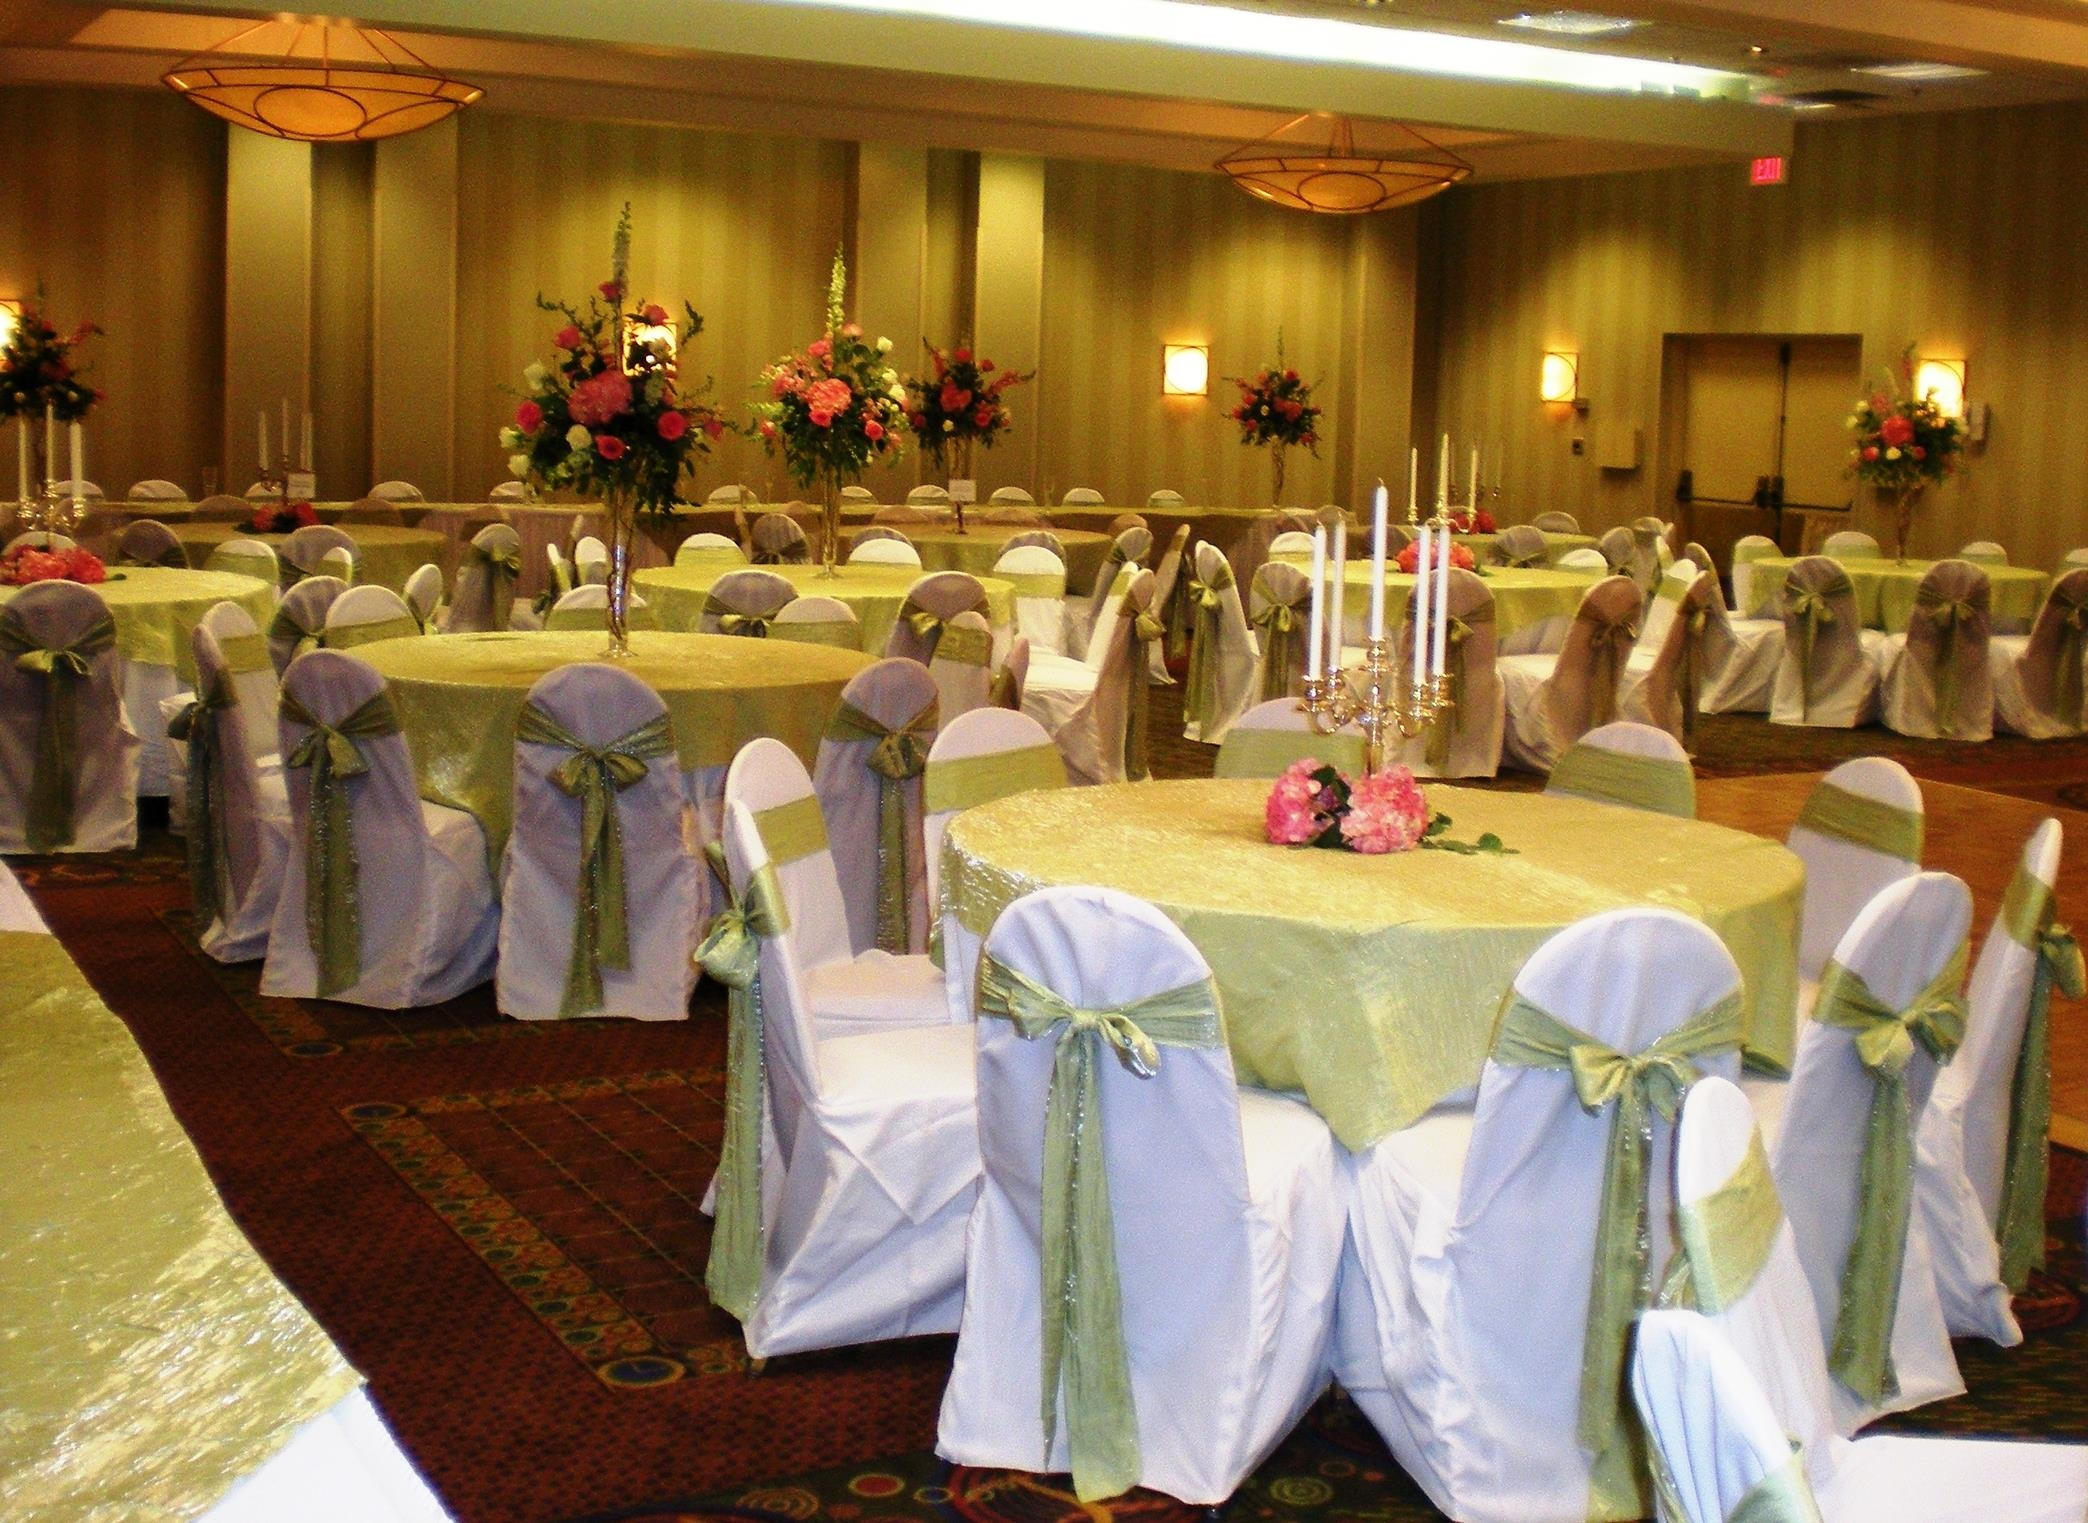 DoubleTree by Hilton Hotel Oak Ridge - Knoxville image 16